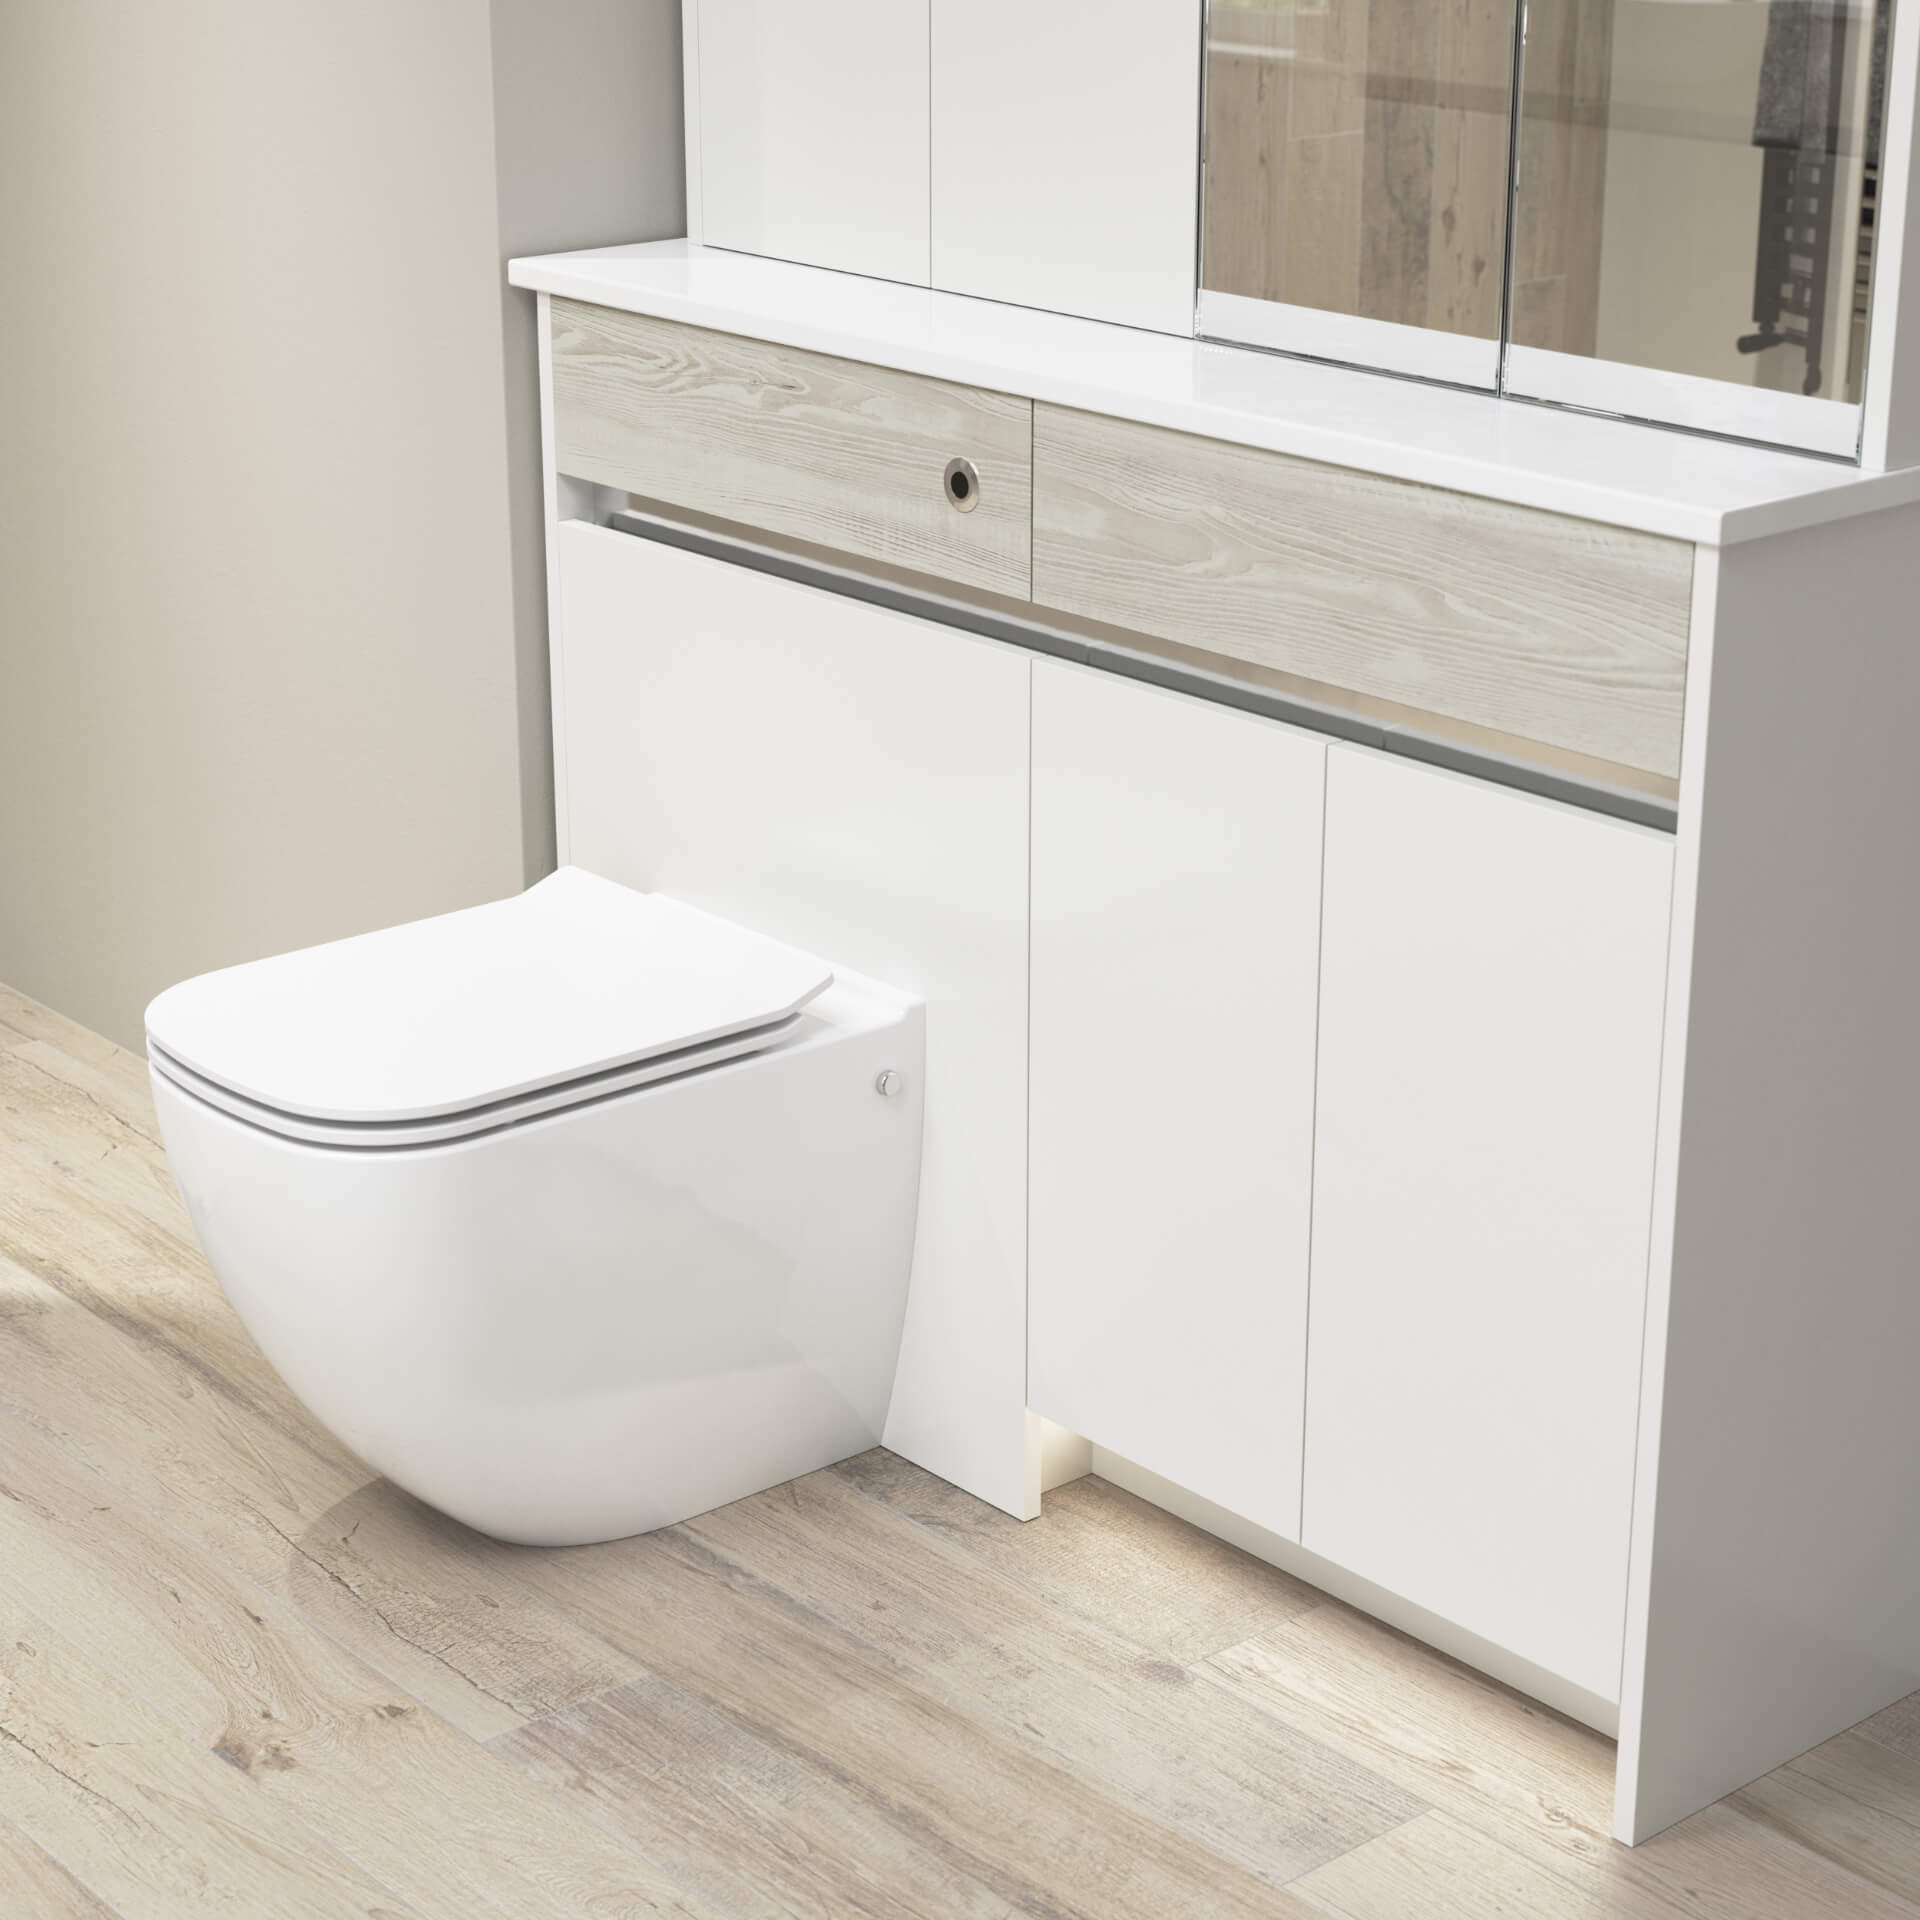 Utopia Bathroom Contemporary Fitted Toilet Unit